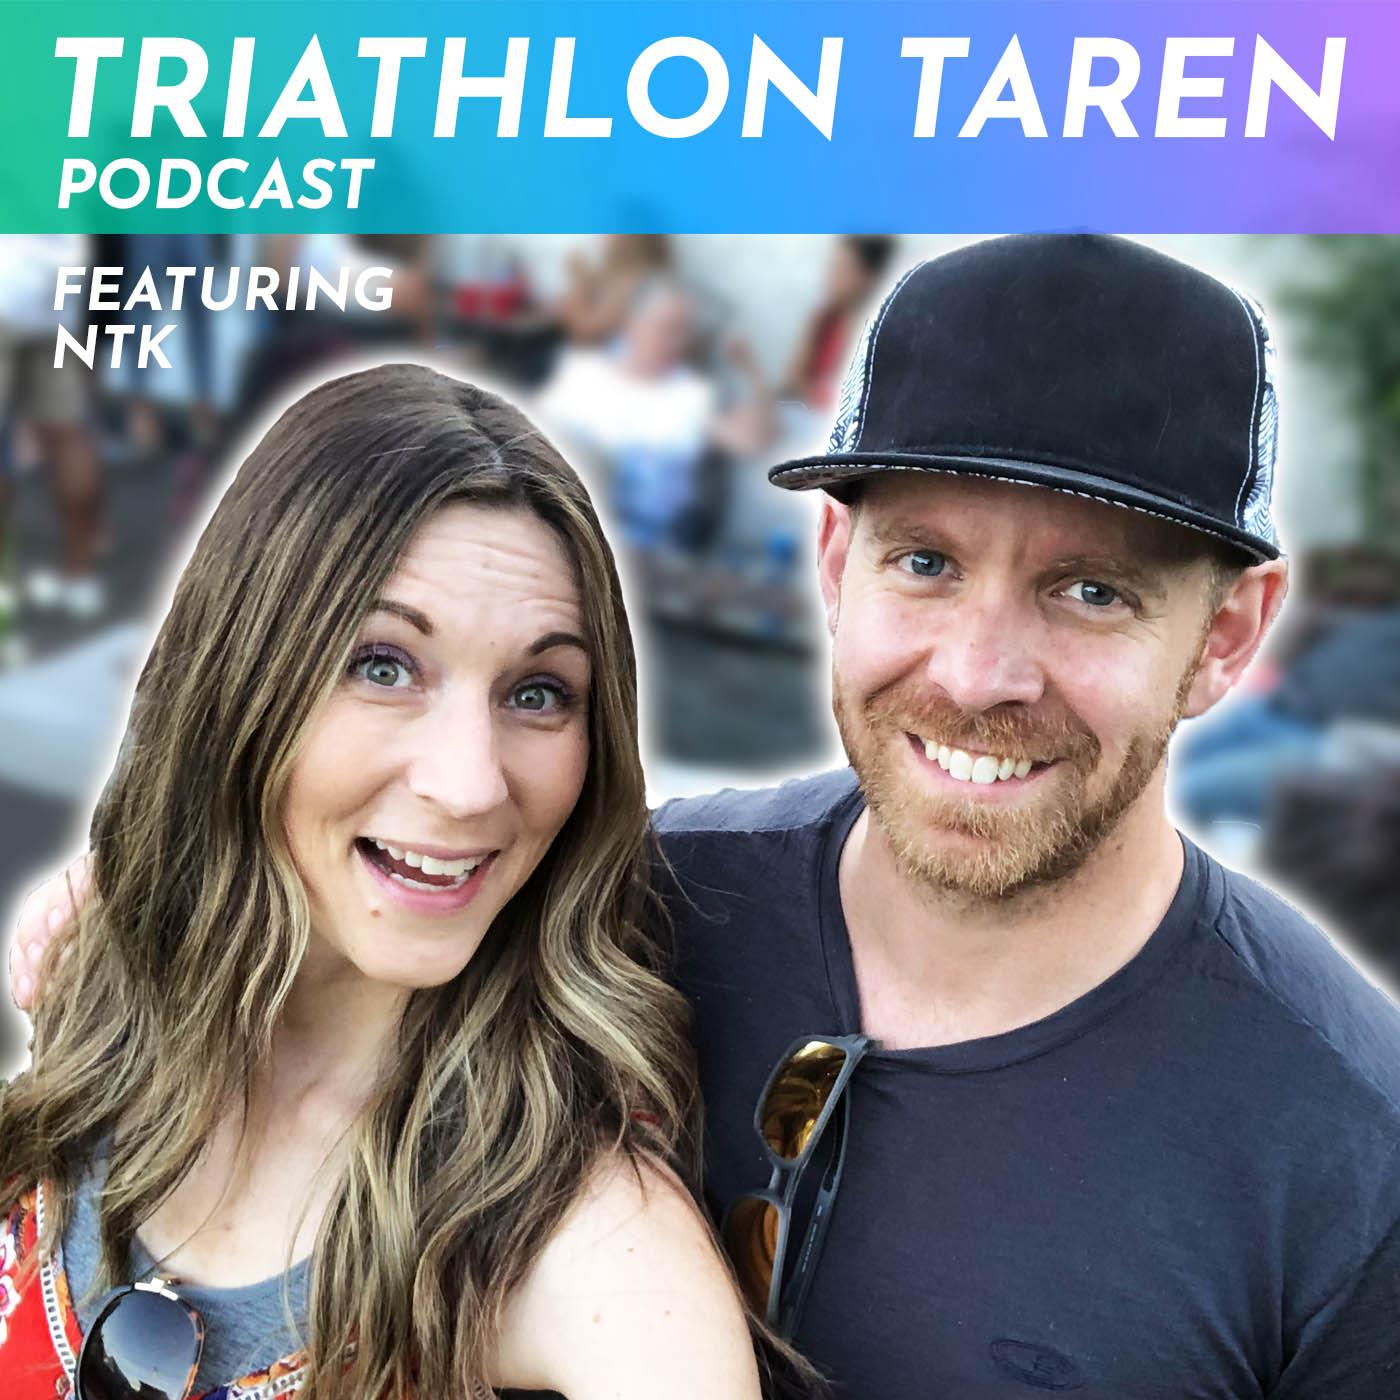 Triathlon Taren Podcast show art